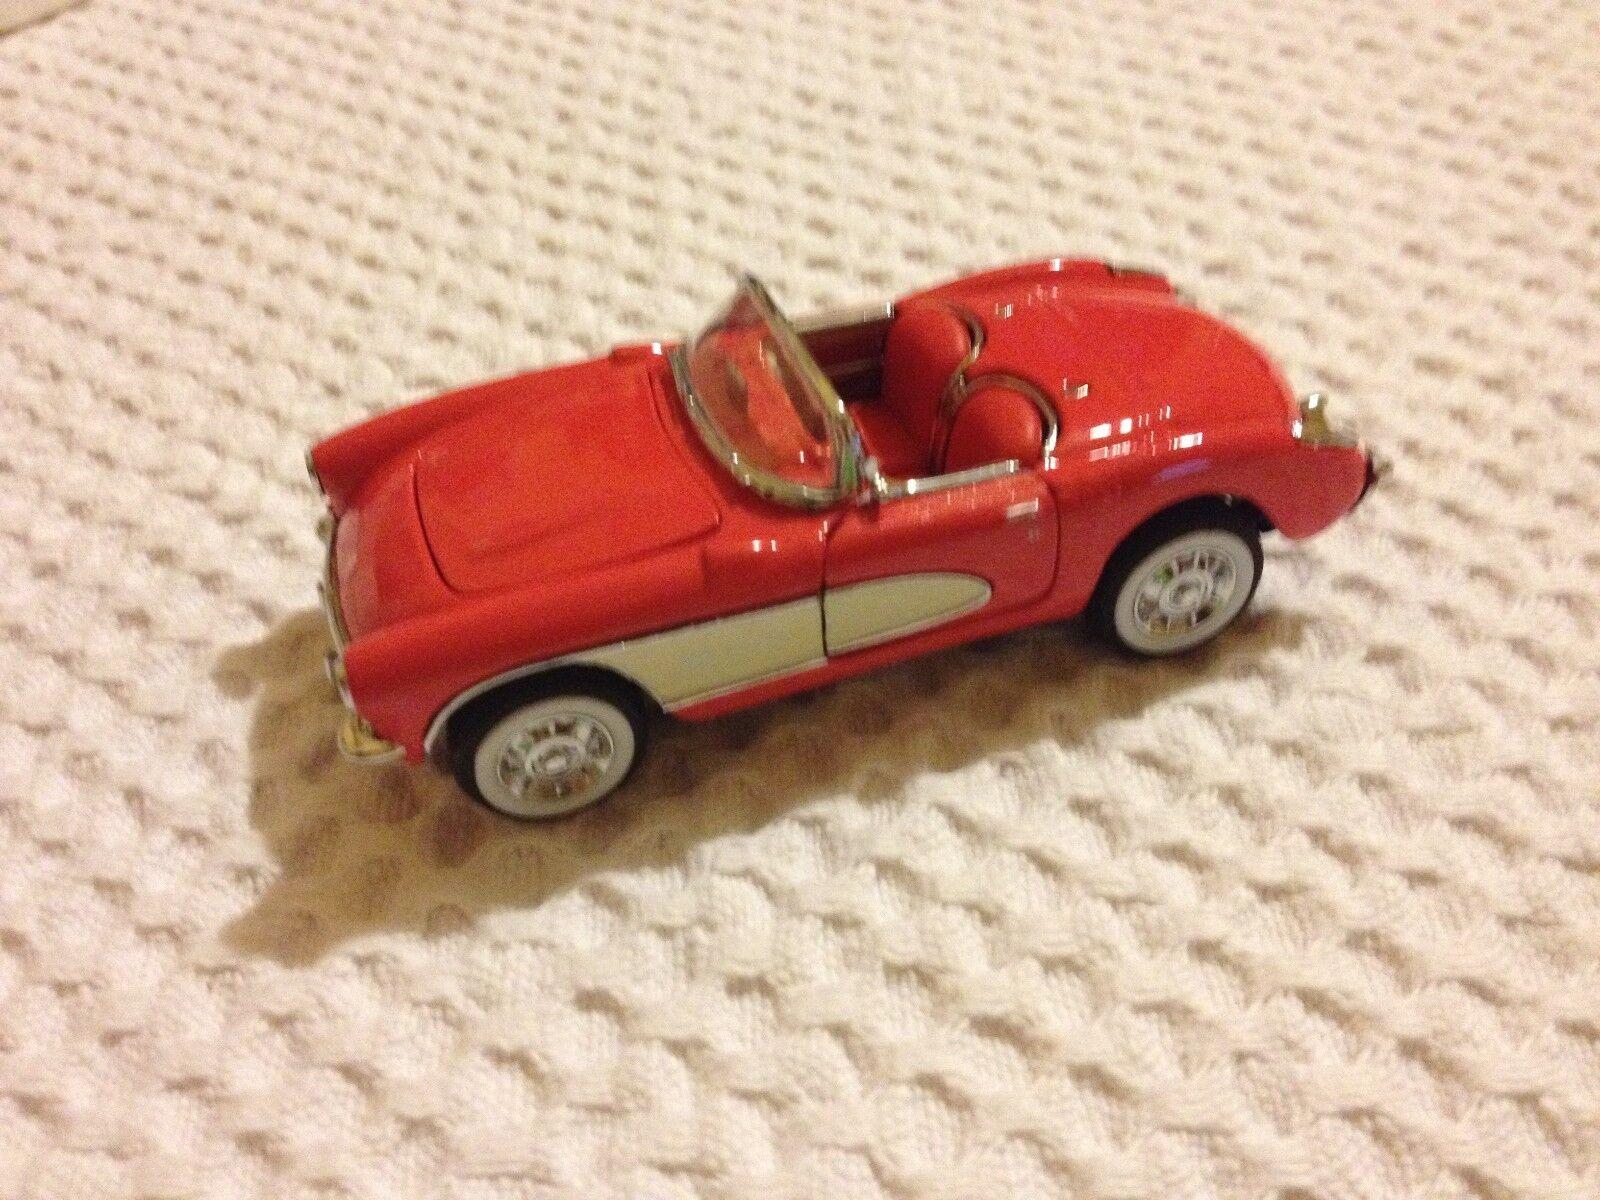 Franklin - mint - 1957 corvette - oldtimer aus den 50er jahren